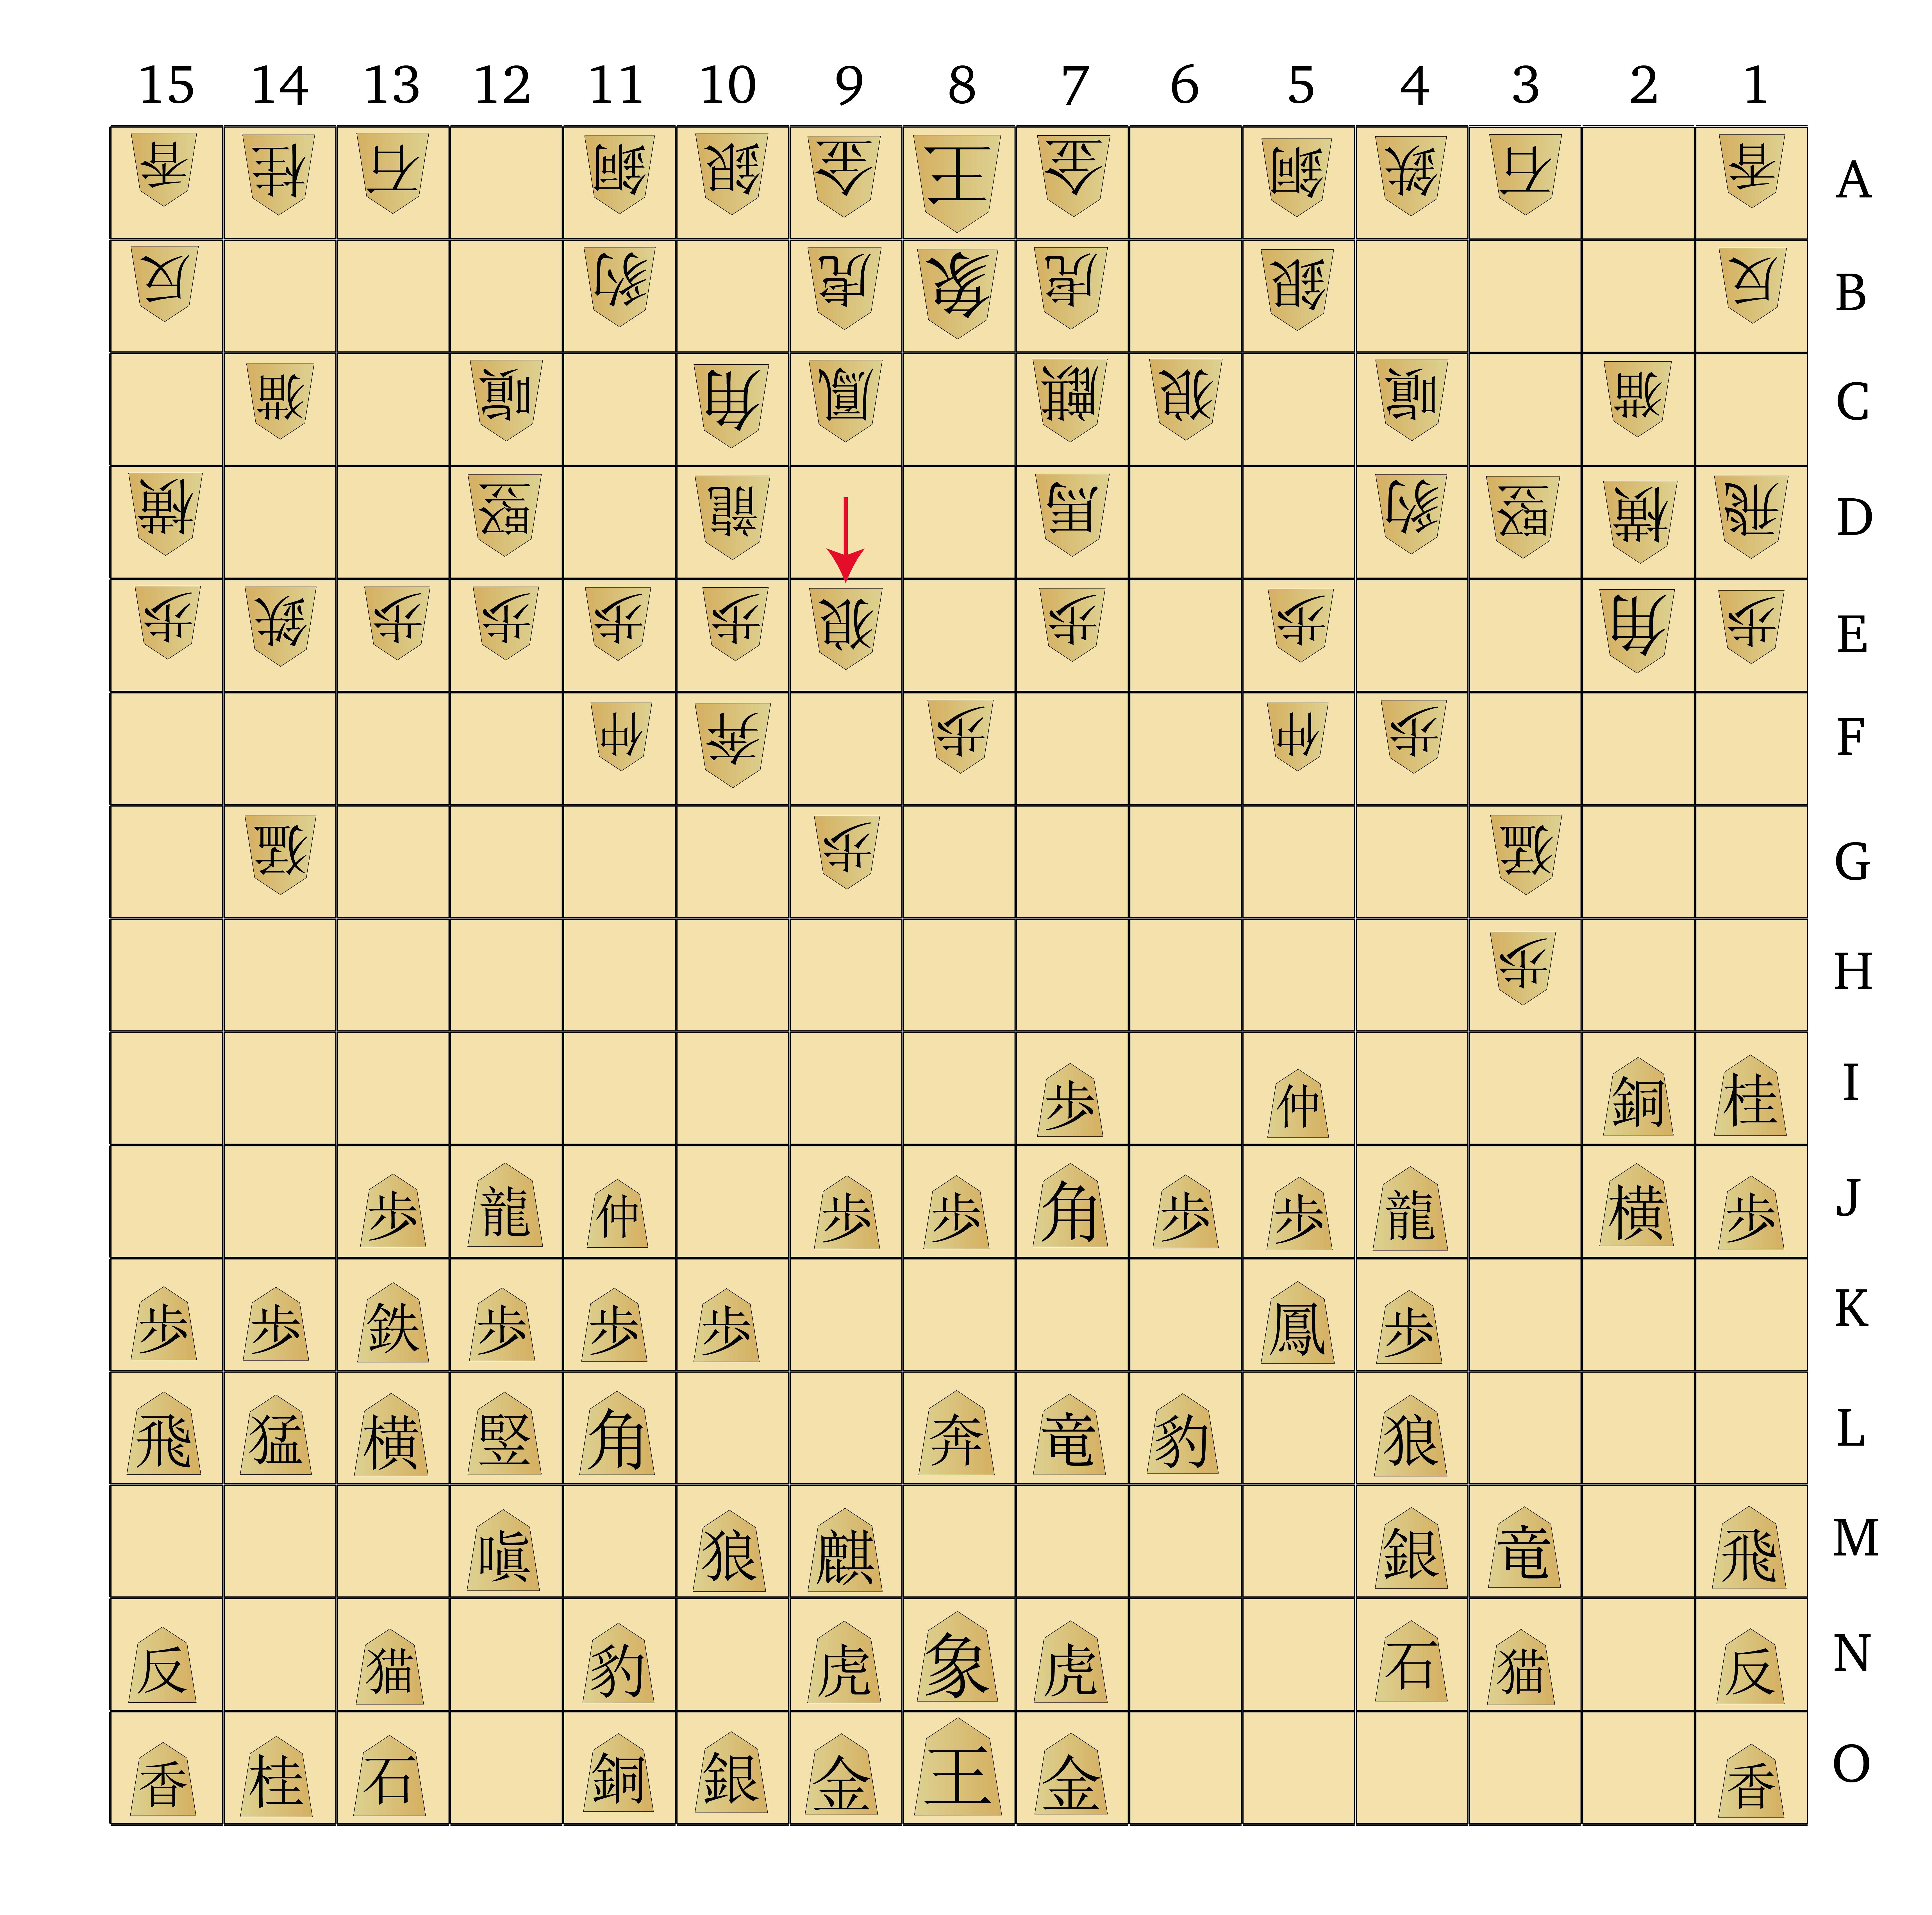 Dai Shogi 420 -- Move 140-01